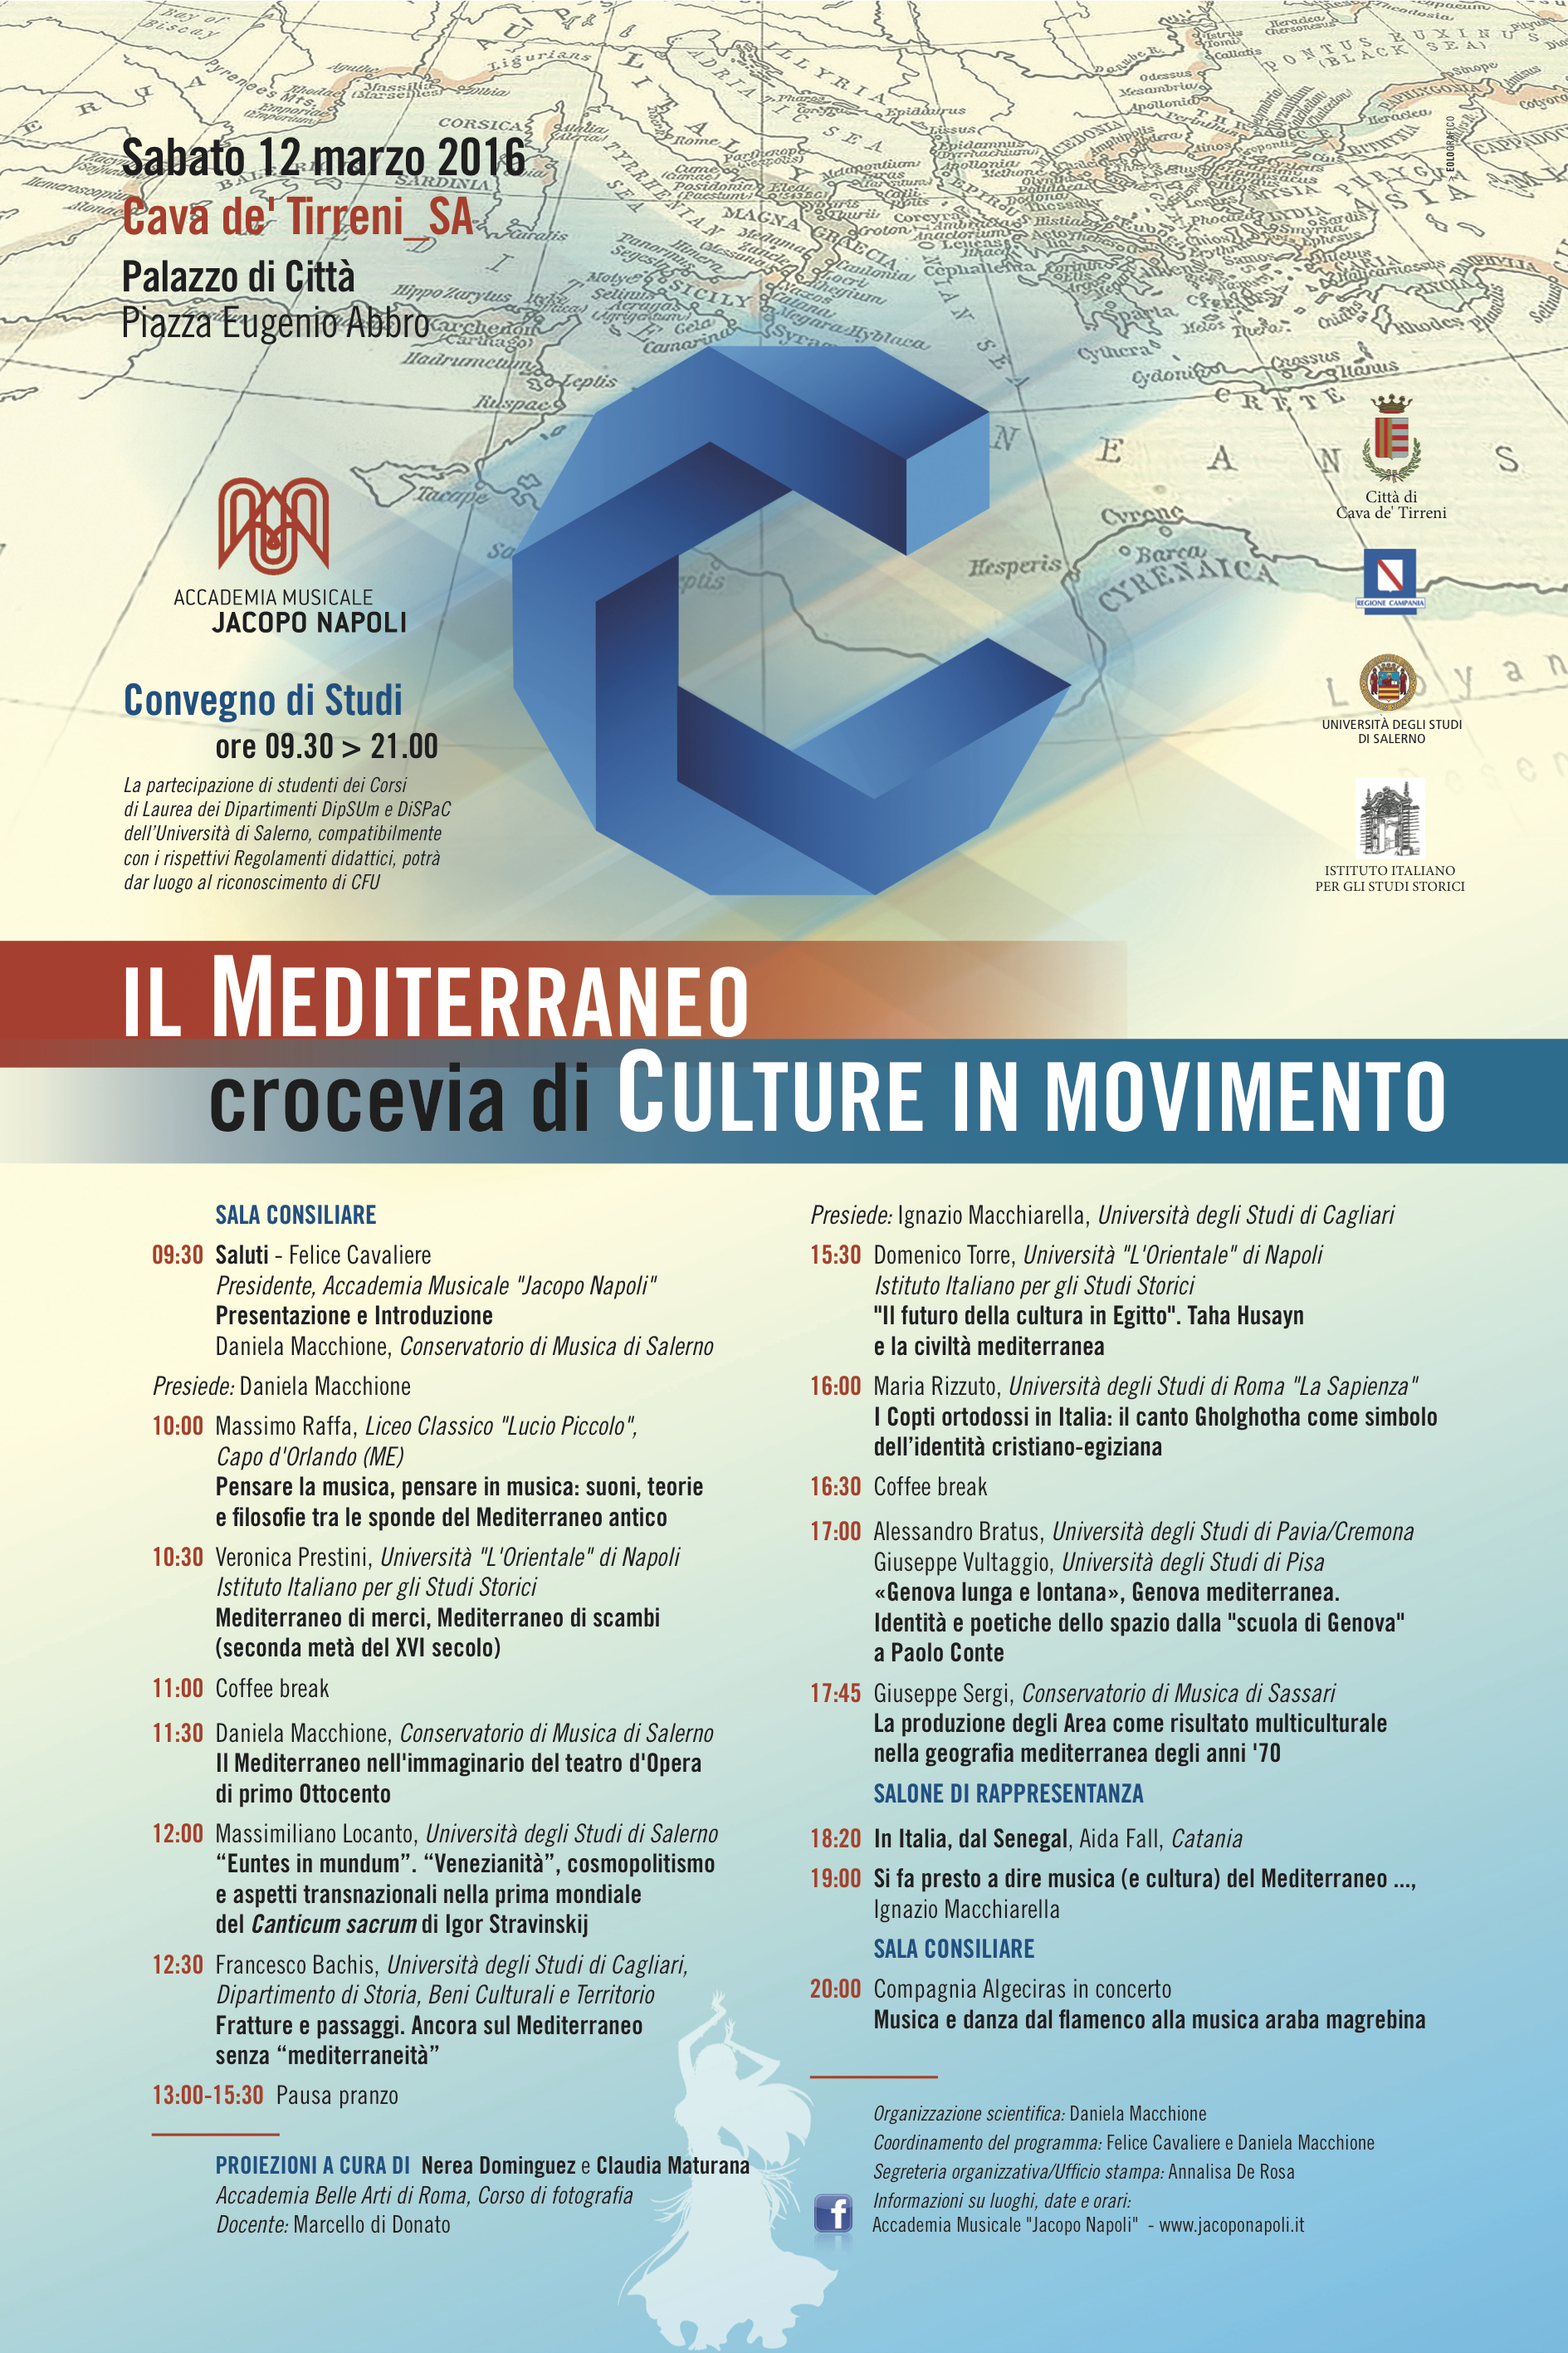 Convegno Culture Mediterraneo